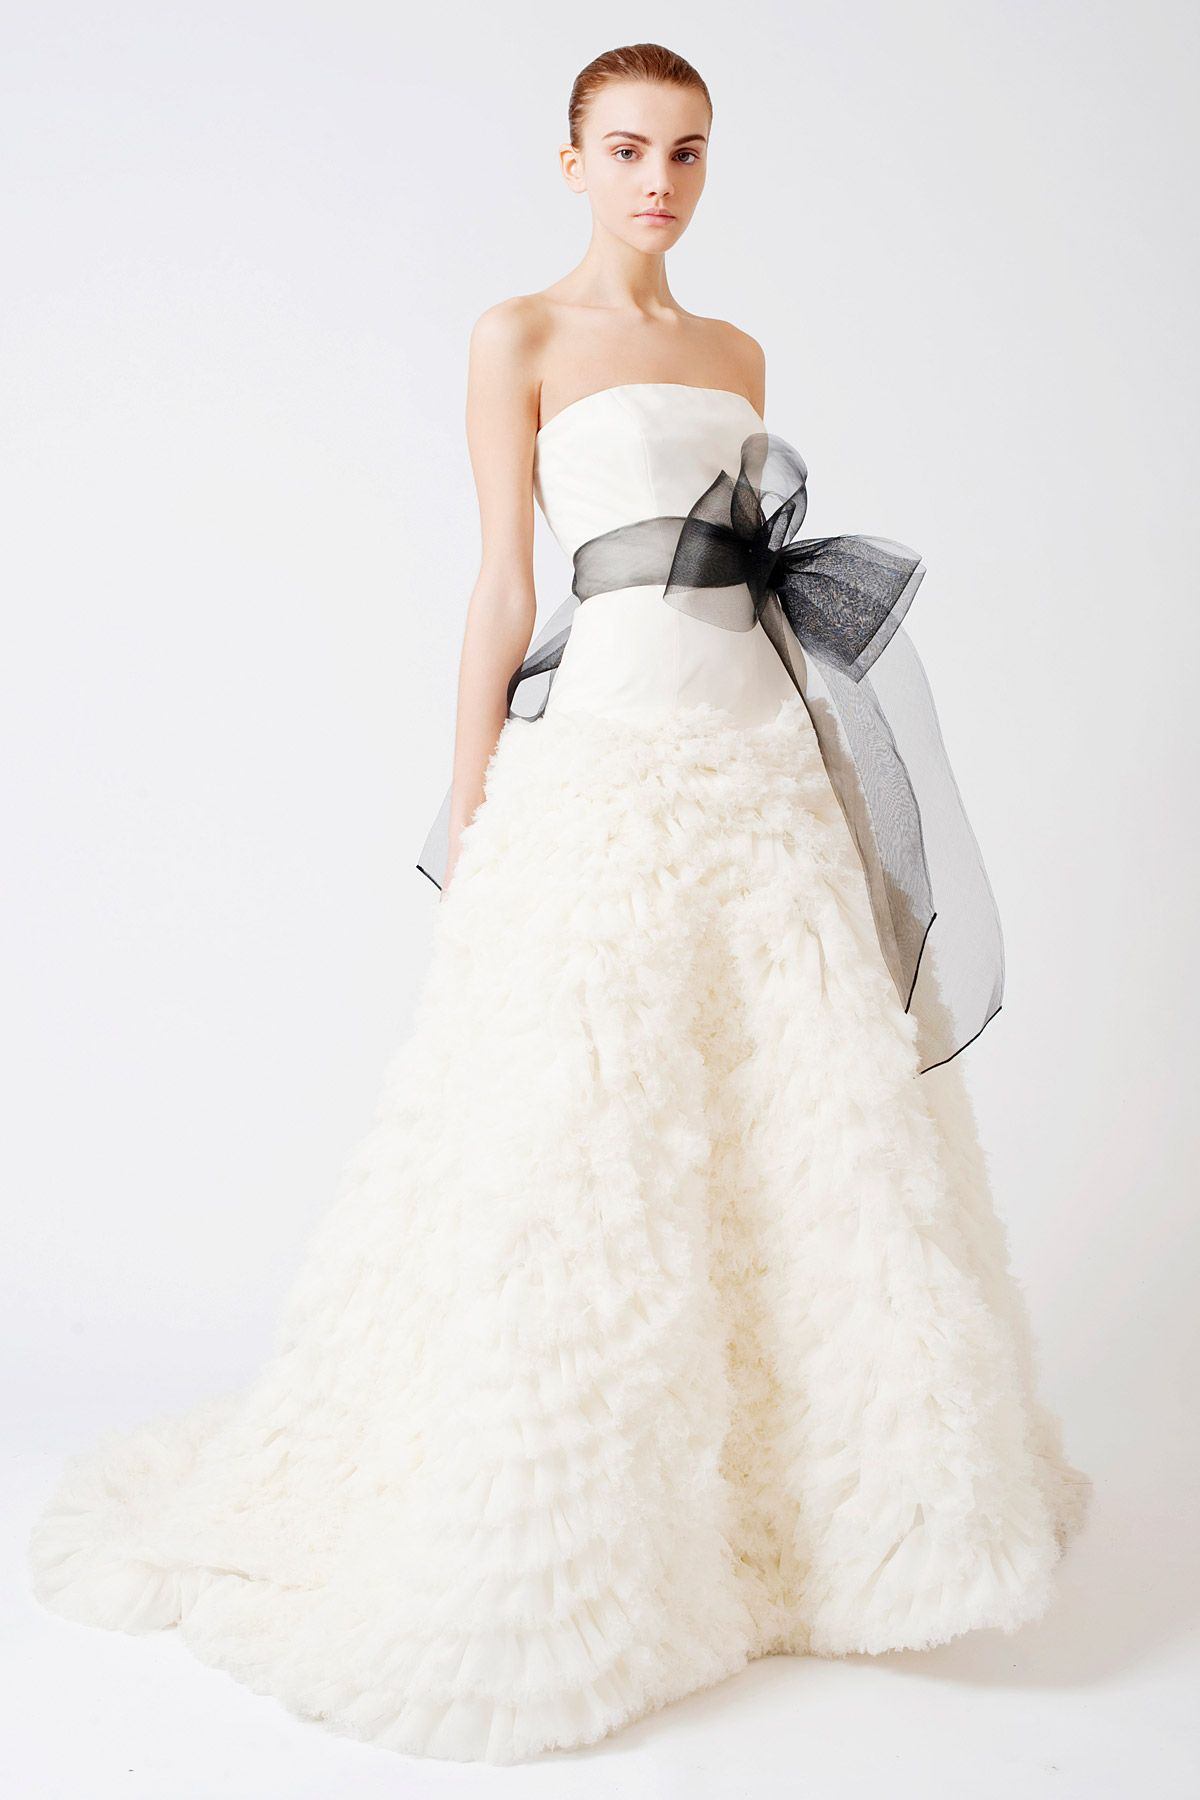 Vera Wang Princess Wedding Dress Luxury Where To Donate Wedding Gowns Luxury Great Col Backyard Wedding Dresses Wedding Dresses Vera Wang Dream Wedding Dresses [ 2730 x 2048 Pixel ]